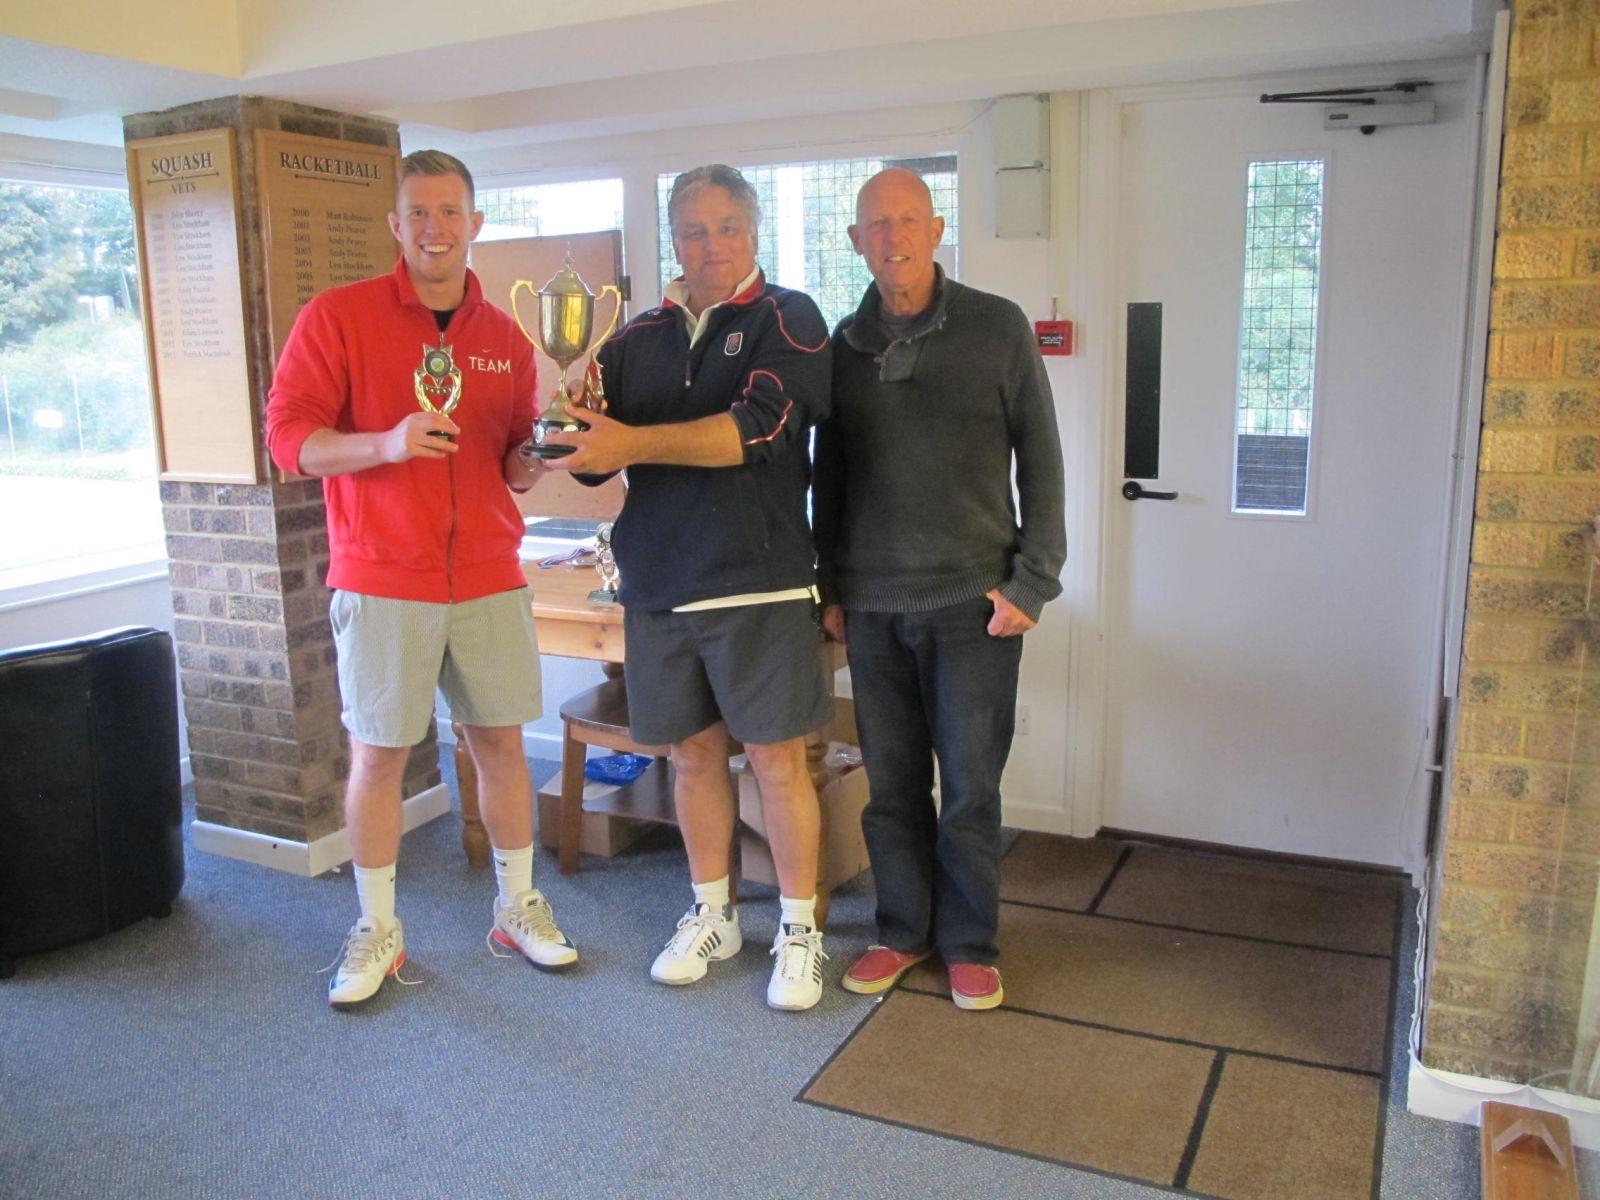 Guy O'Neill & Paul Scott, Men's Doubles Champions